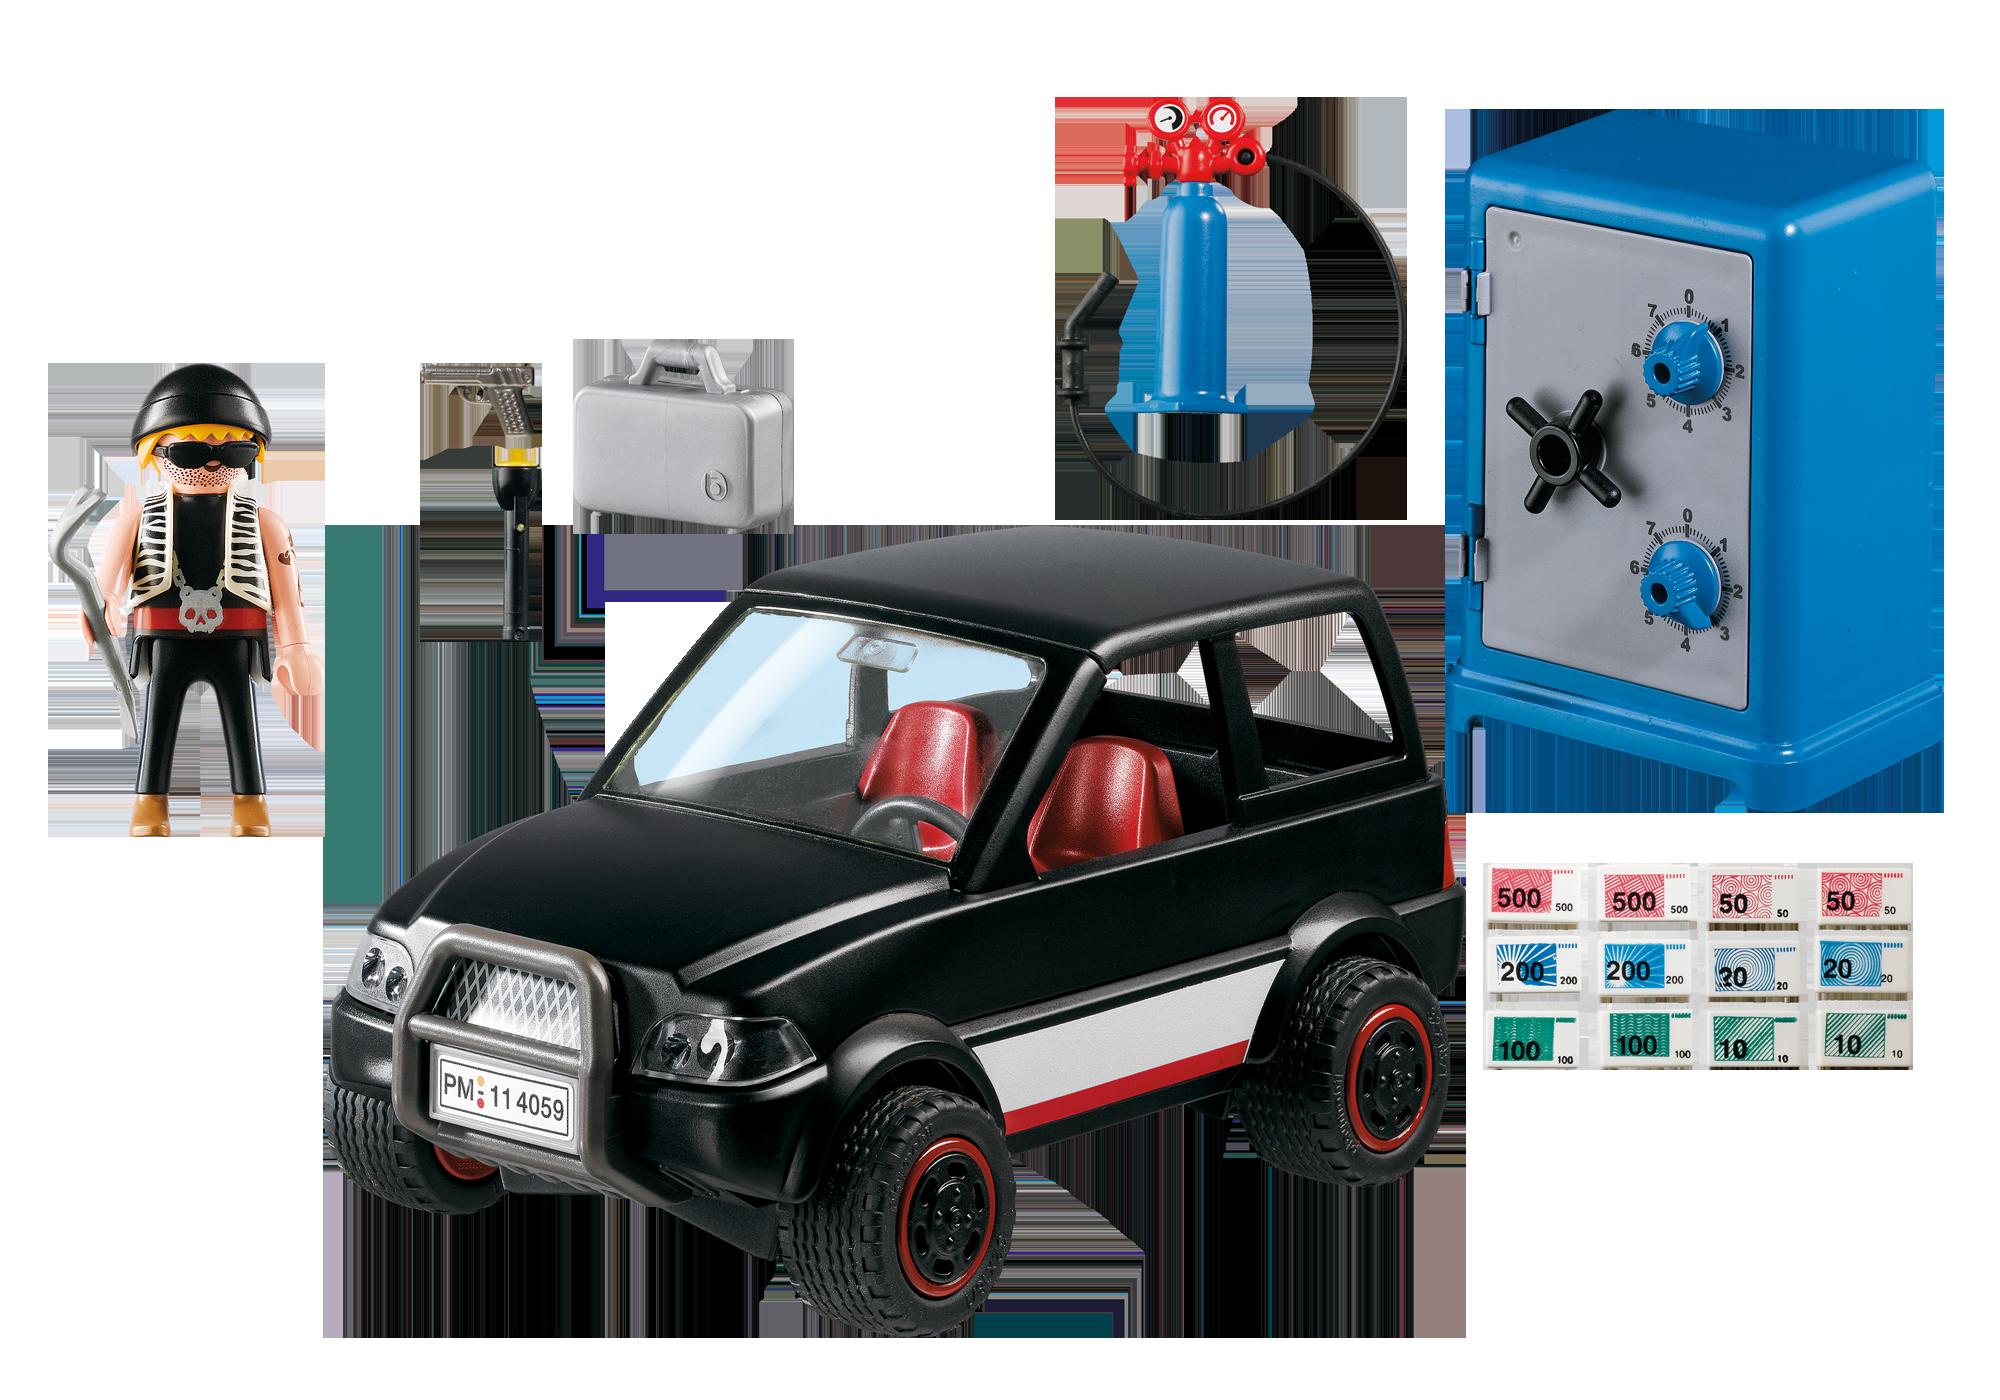 http://media.playmobil.com/i/playmobil/4059_product_box_back/Thief with Safe and Getaway Car